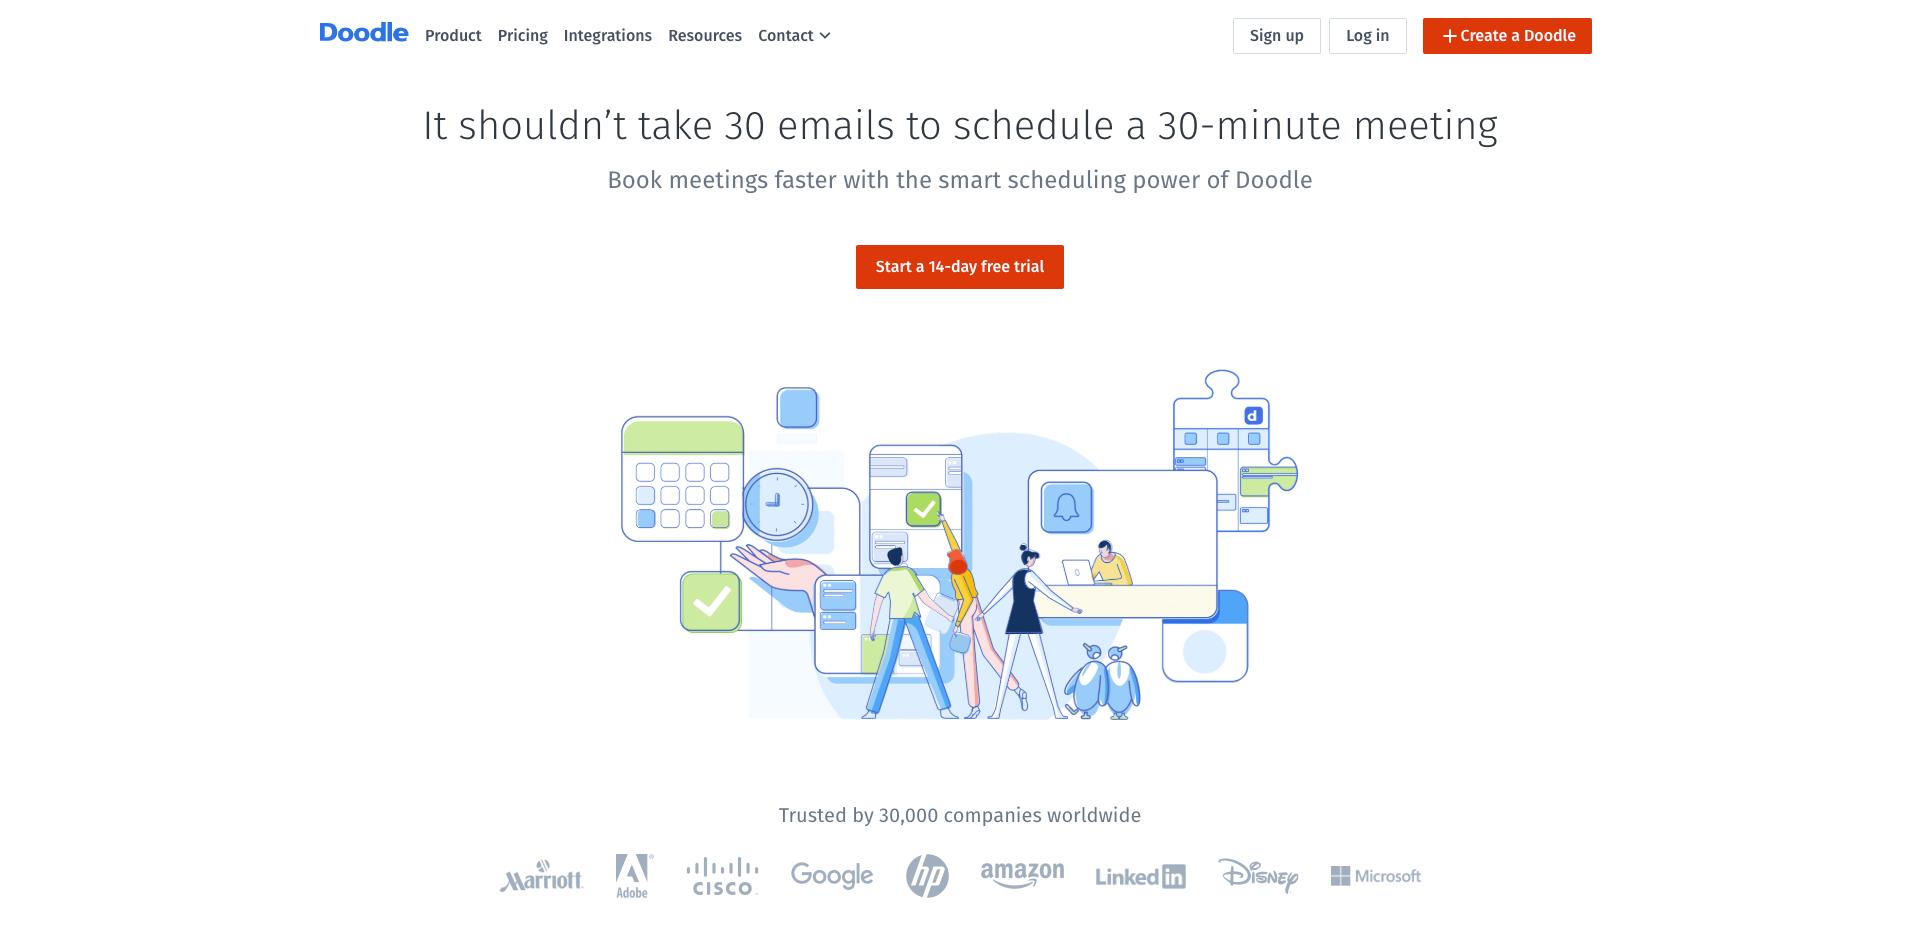 doodle homepage screenshot